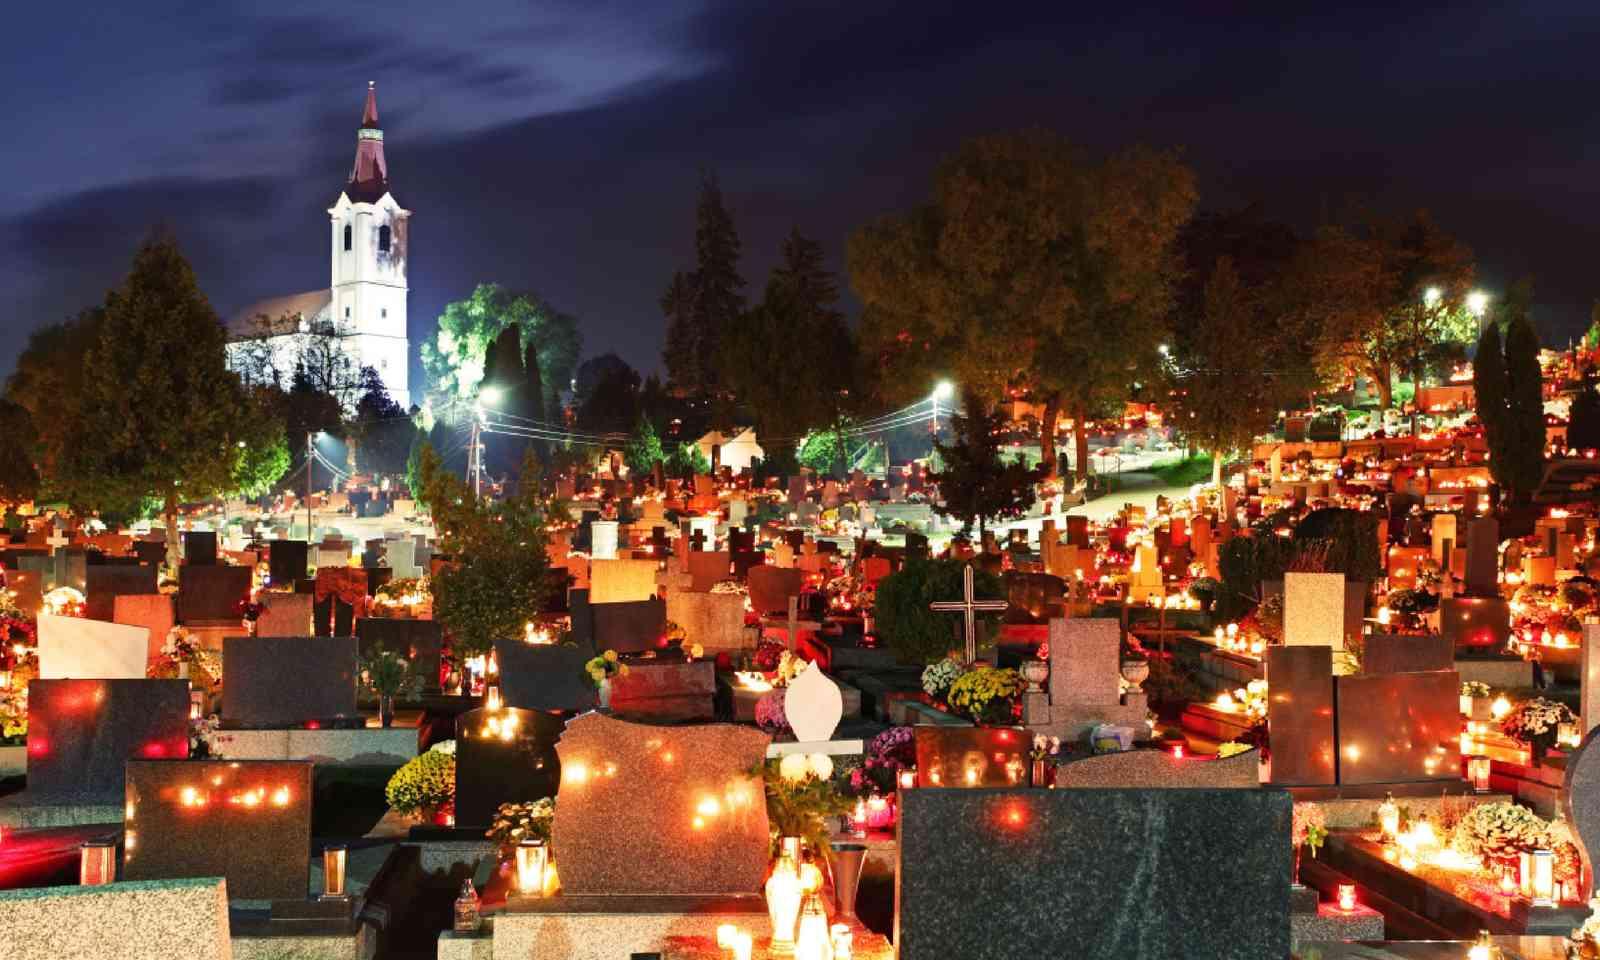 Cemetery at night, Finland (Shutterstock)